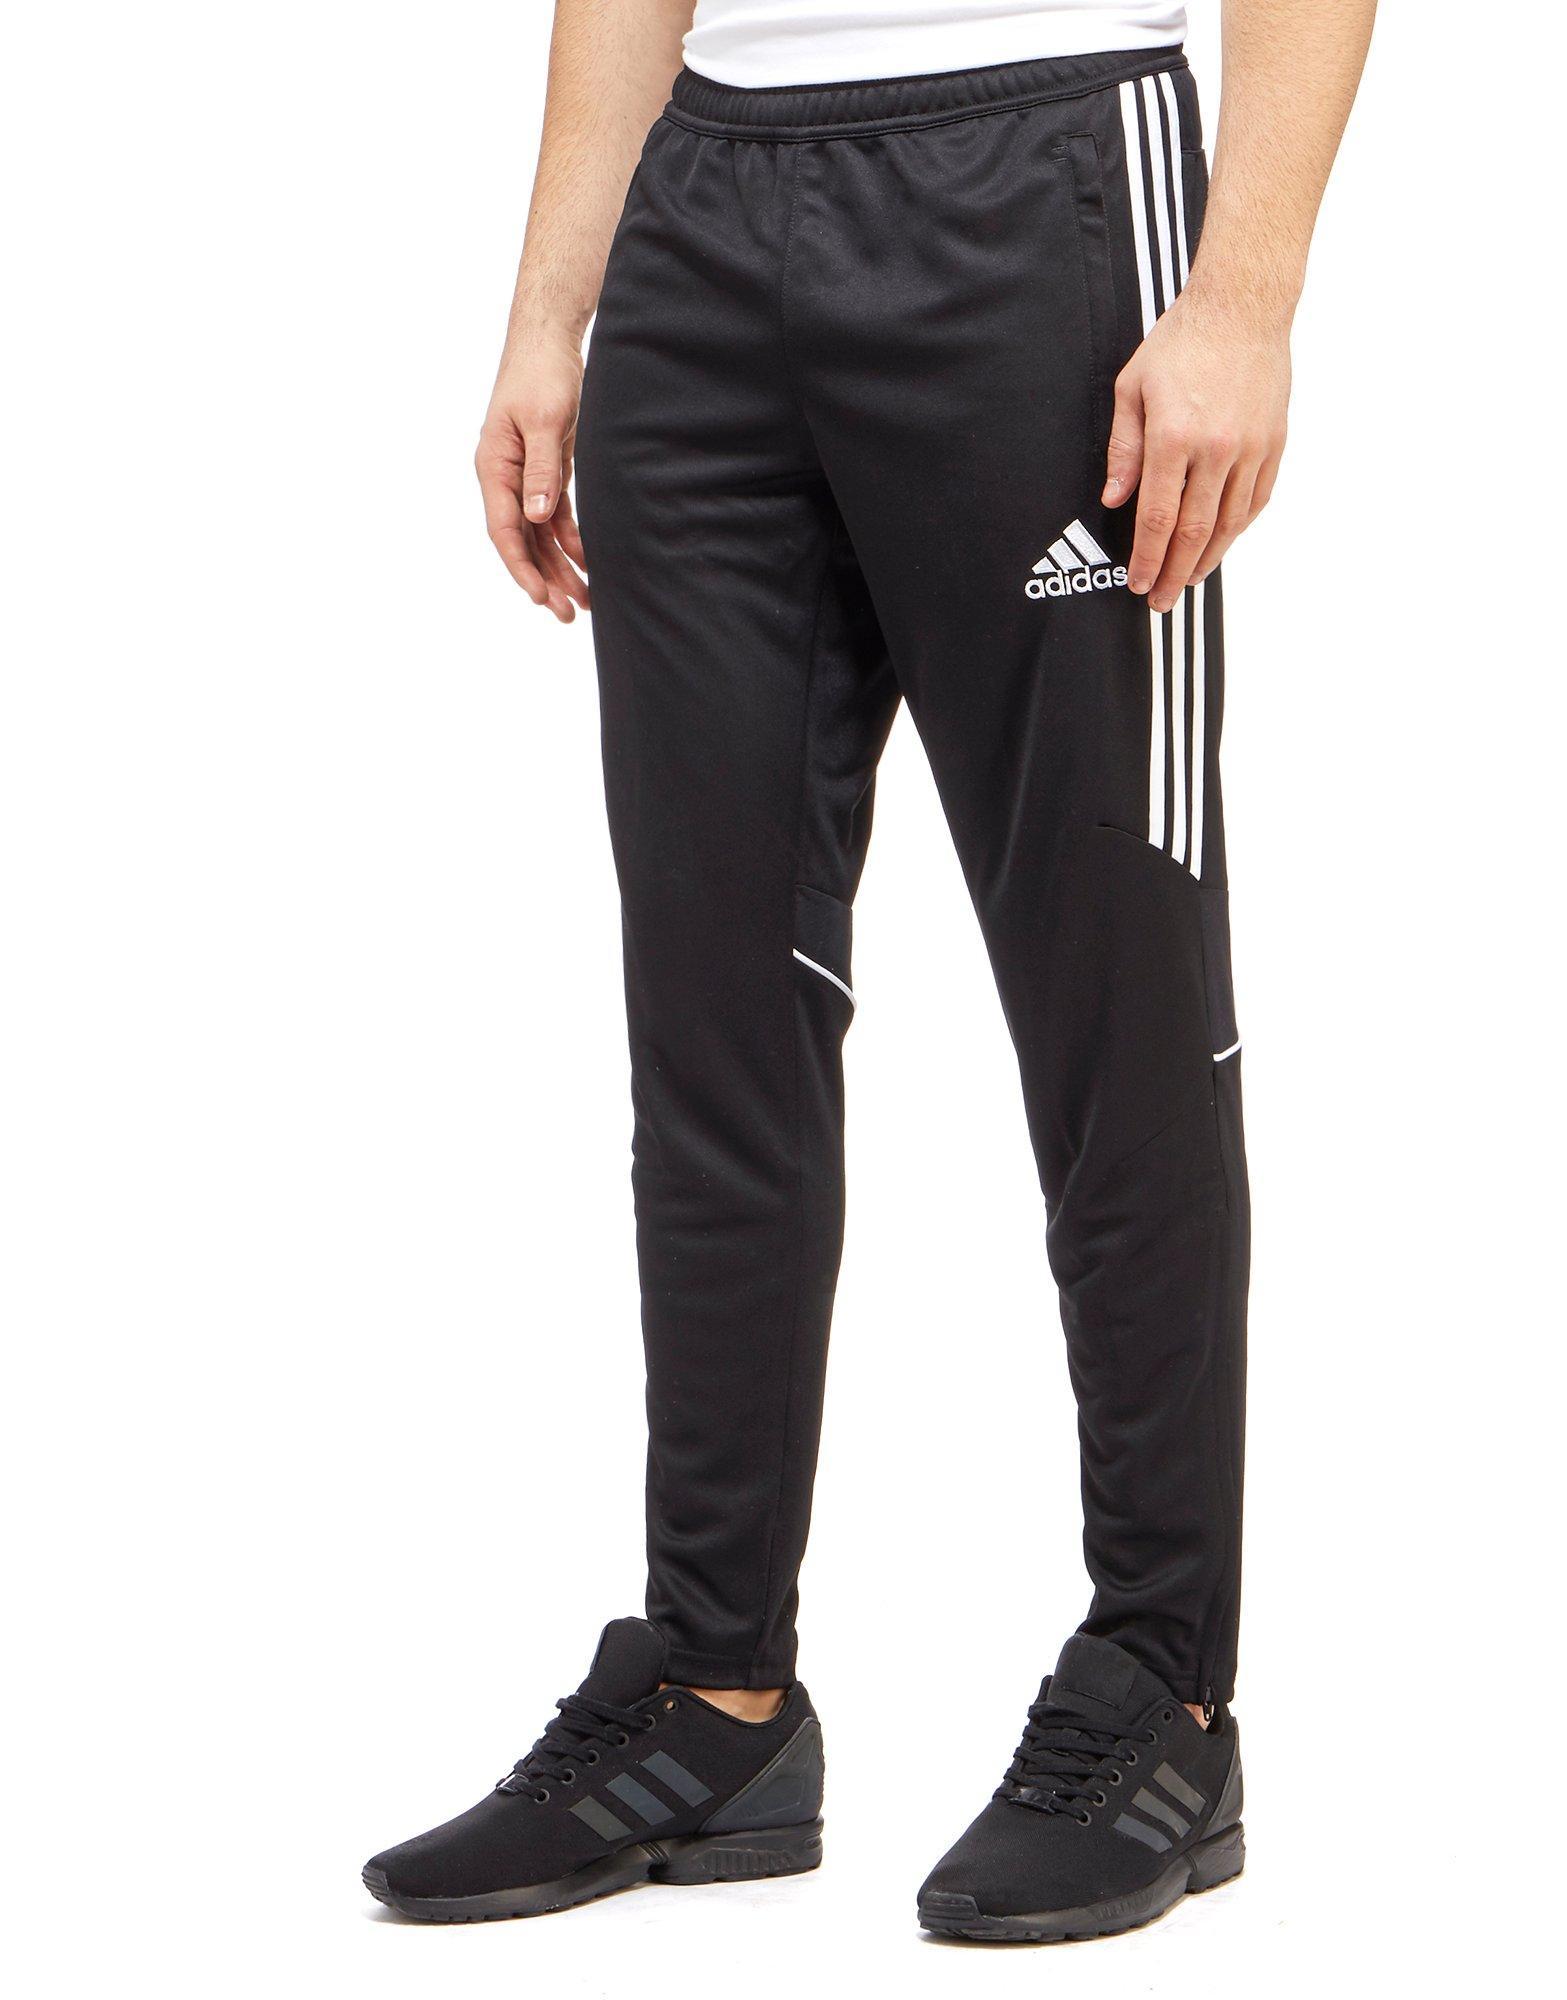 adidas joggers adidas tango pants ... EUPBKGB